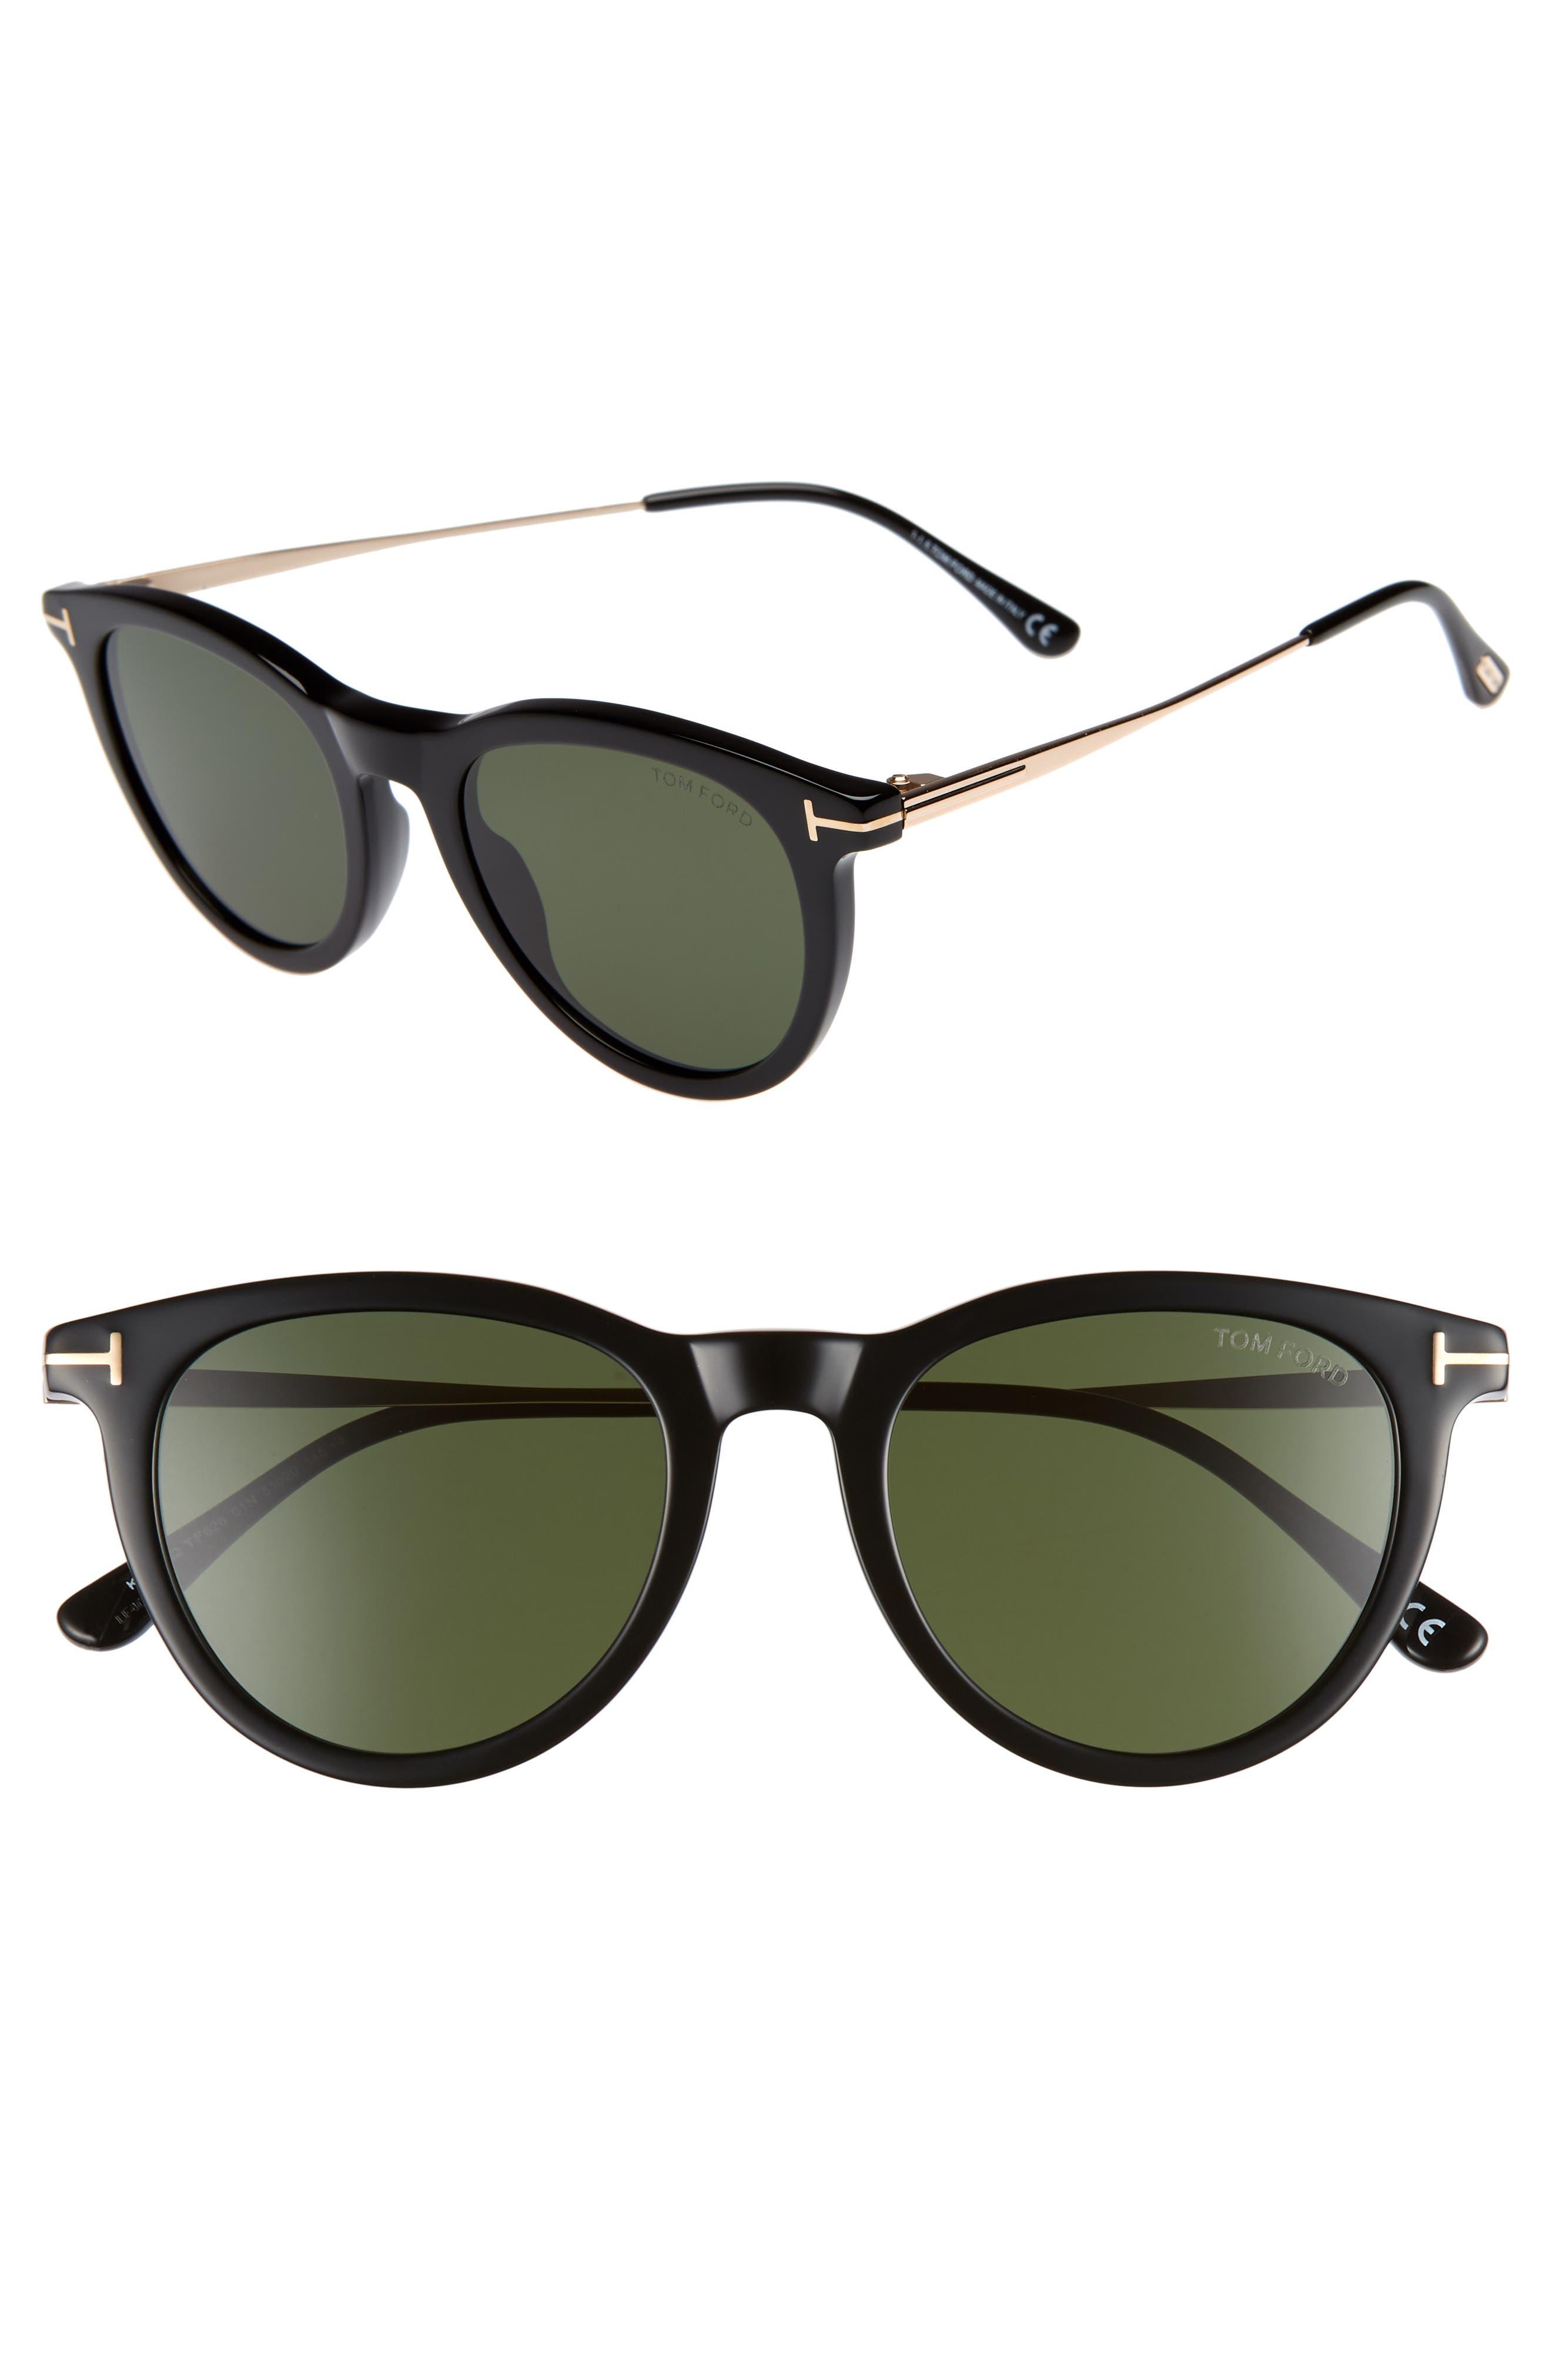 51mm Cat Eye Sunglasses,                         Main,                         color, SHINY BLACK/ GREEN